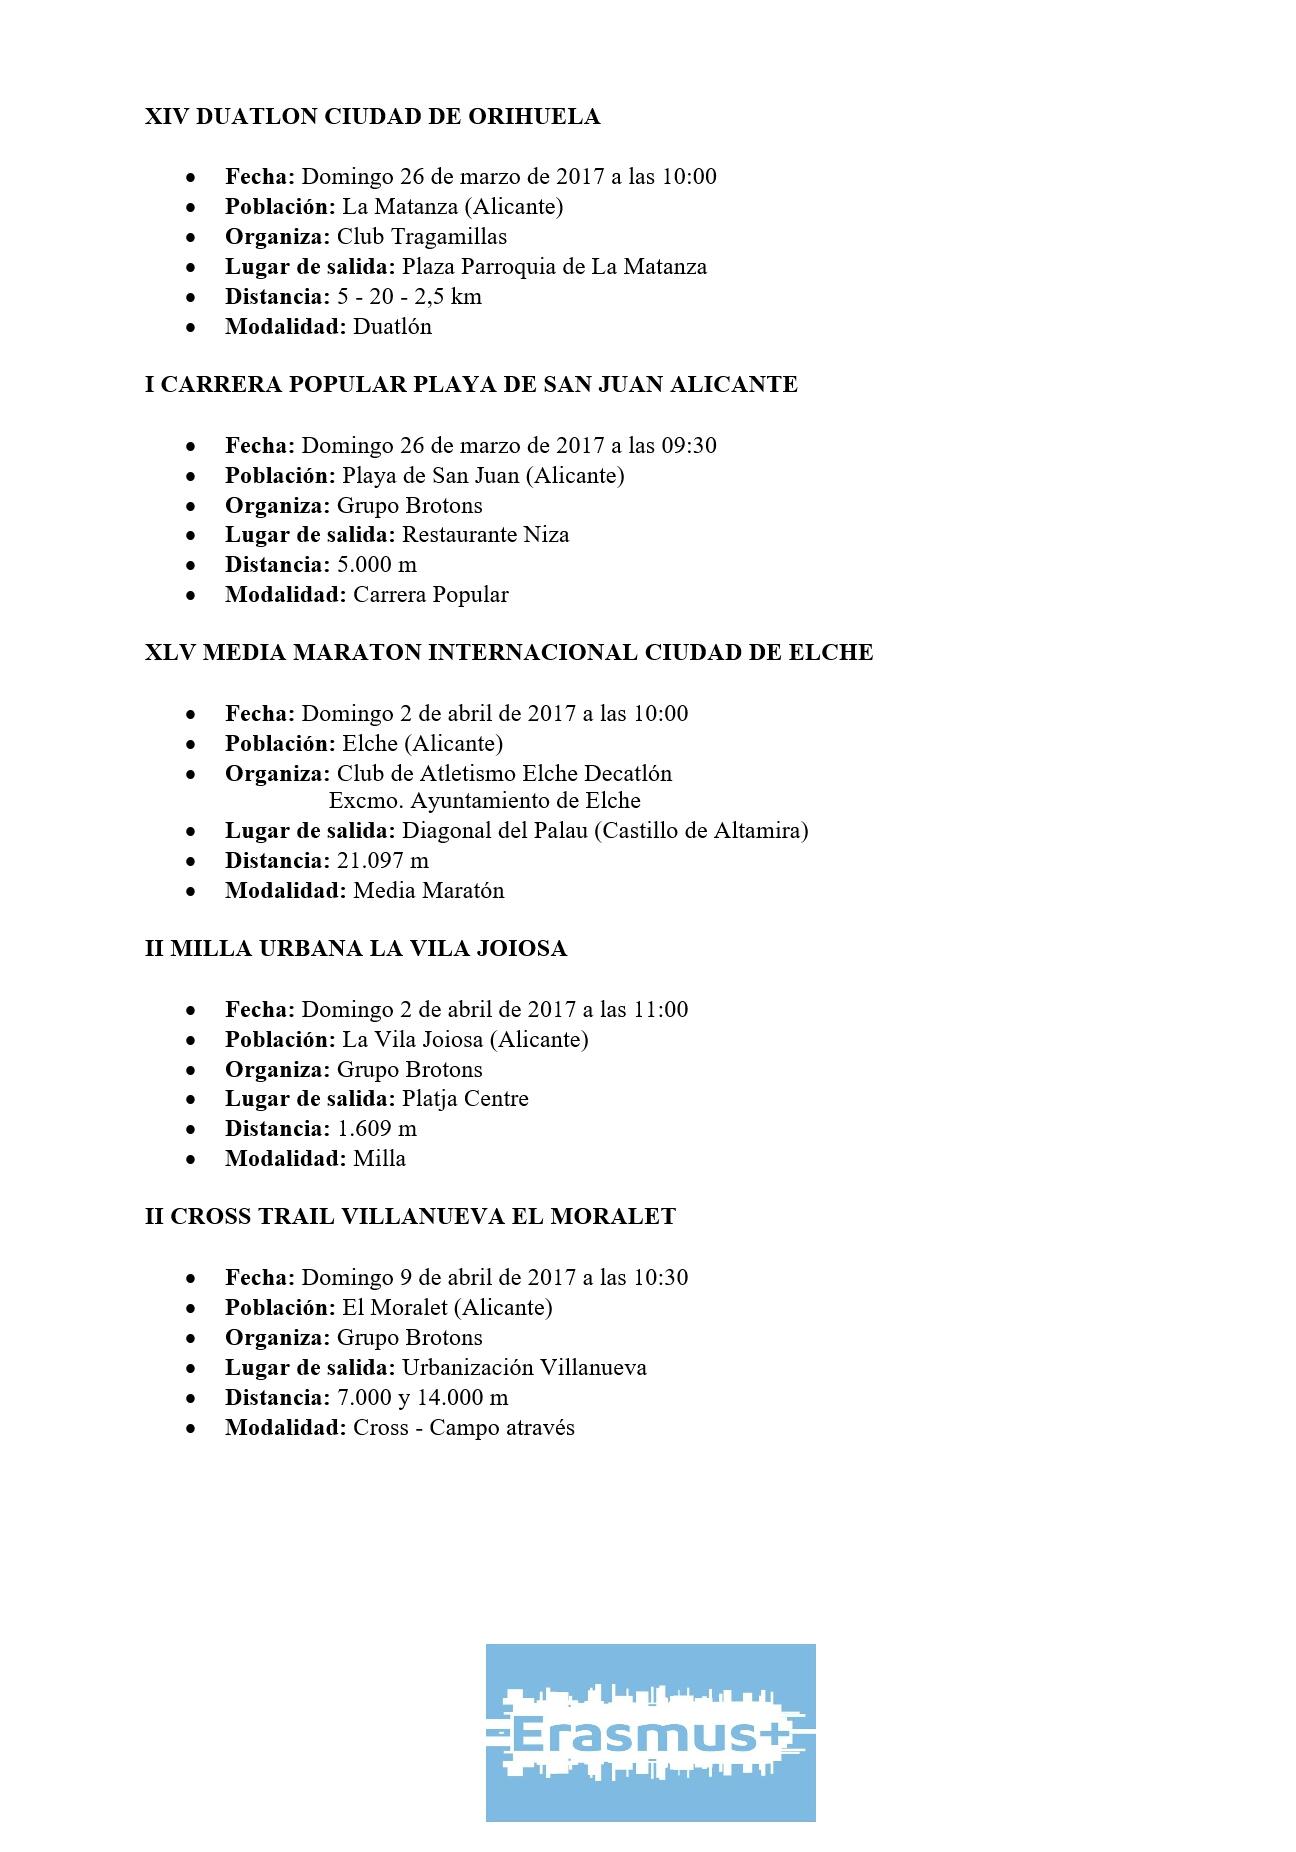 Carreras de 25 – 9 abril (1)